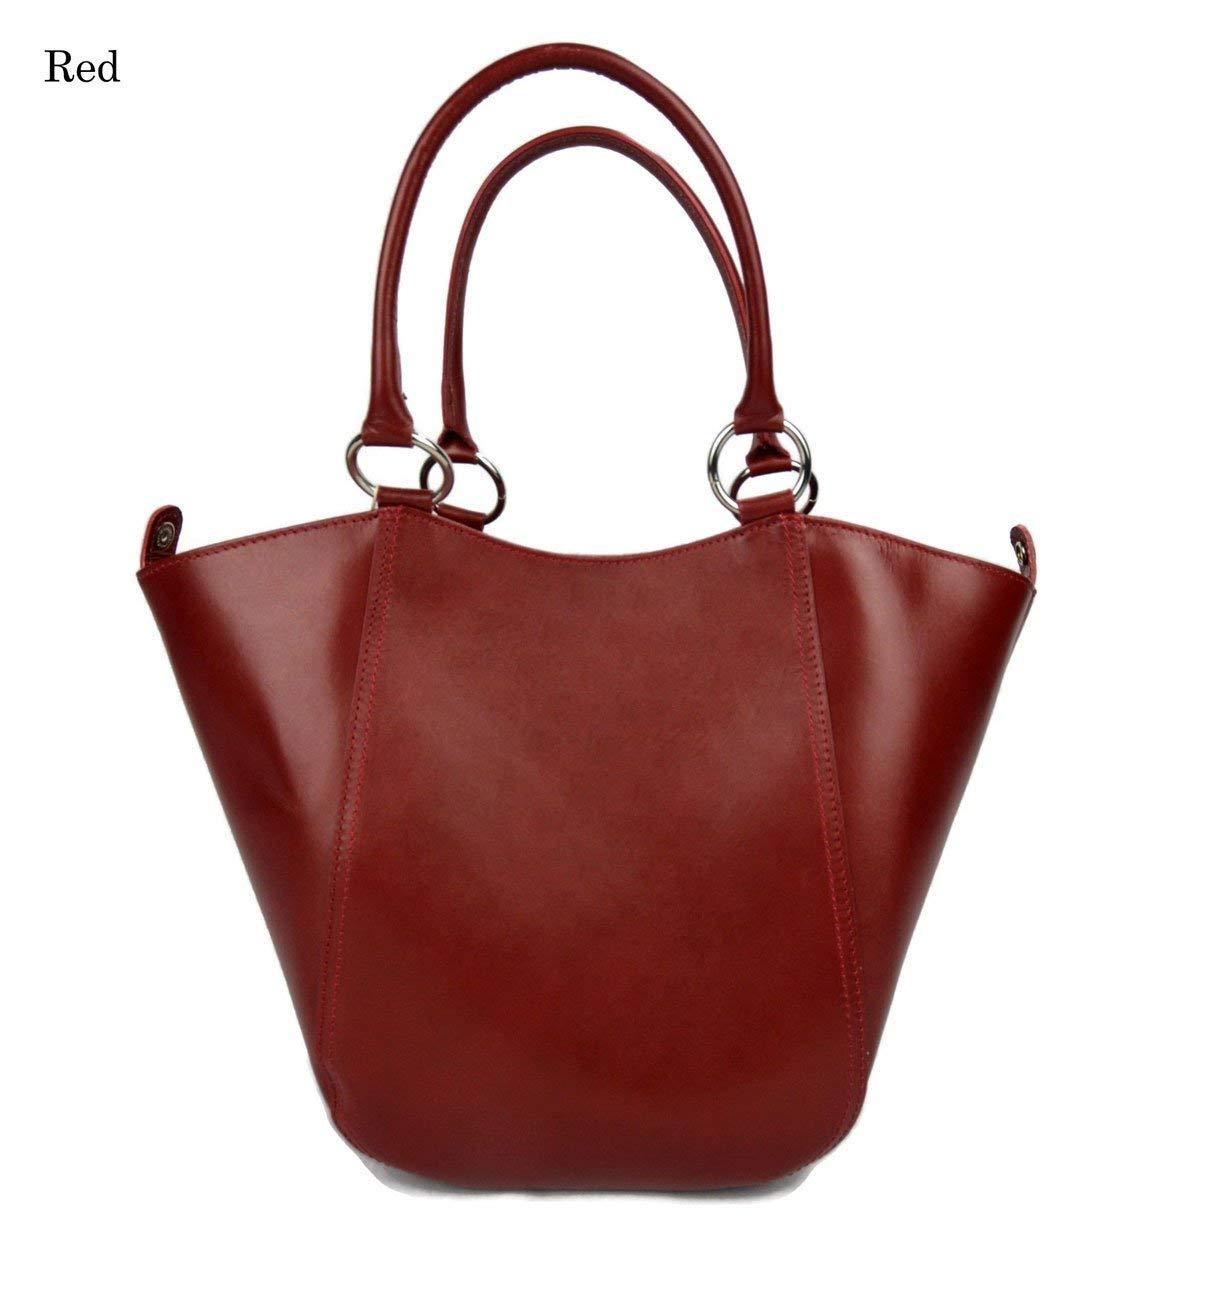 Handbag red leather women leather bag foldable purse leather women ladies crossbody leather bag women satchel tote handbag shopper - handmade-bags